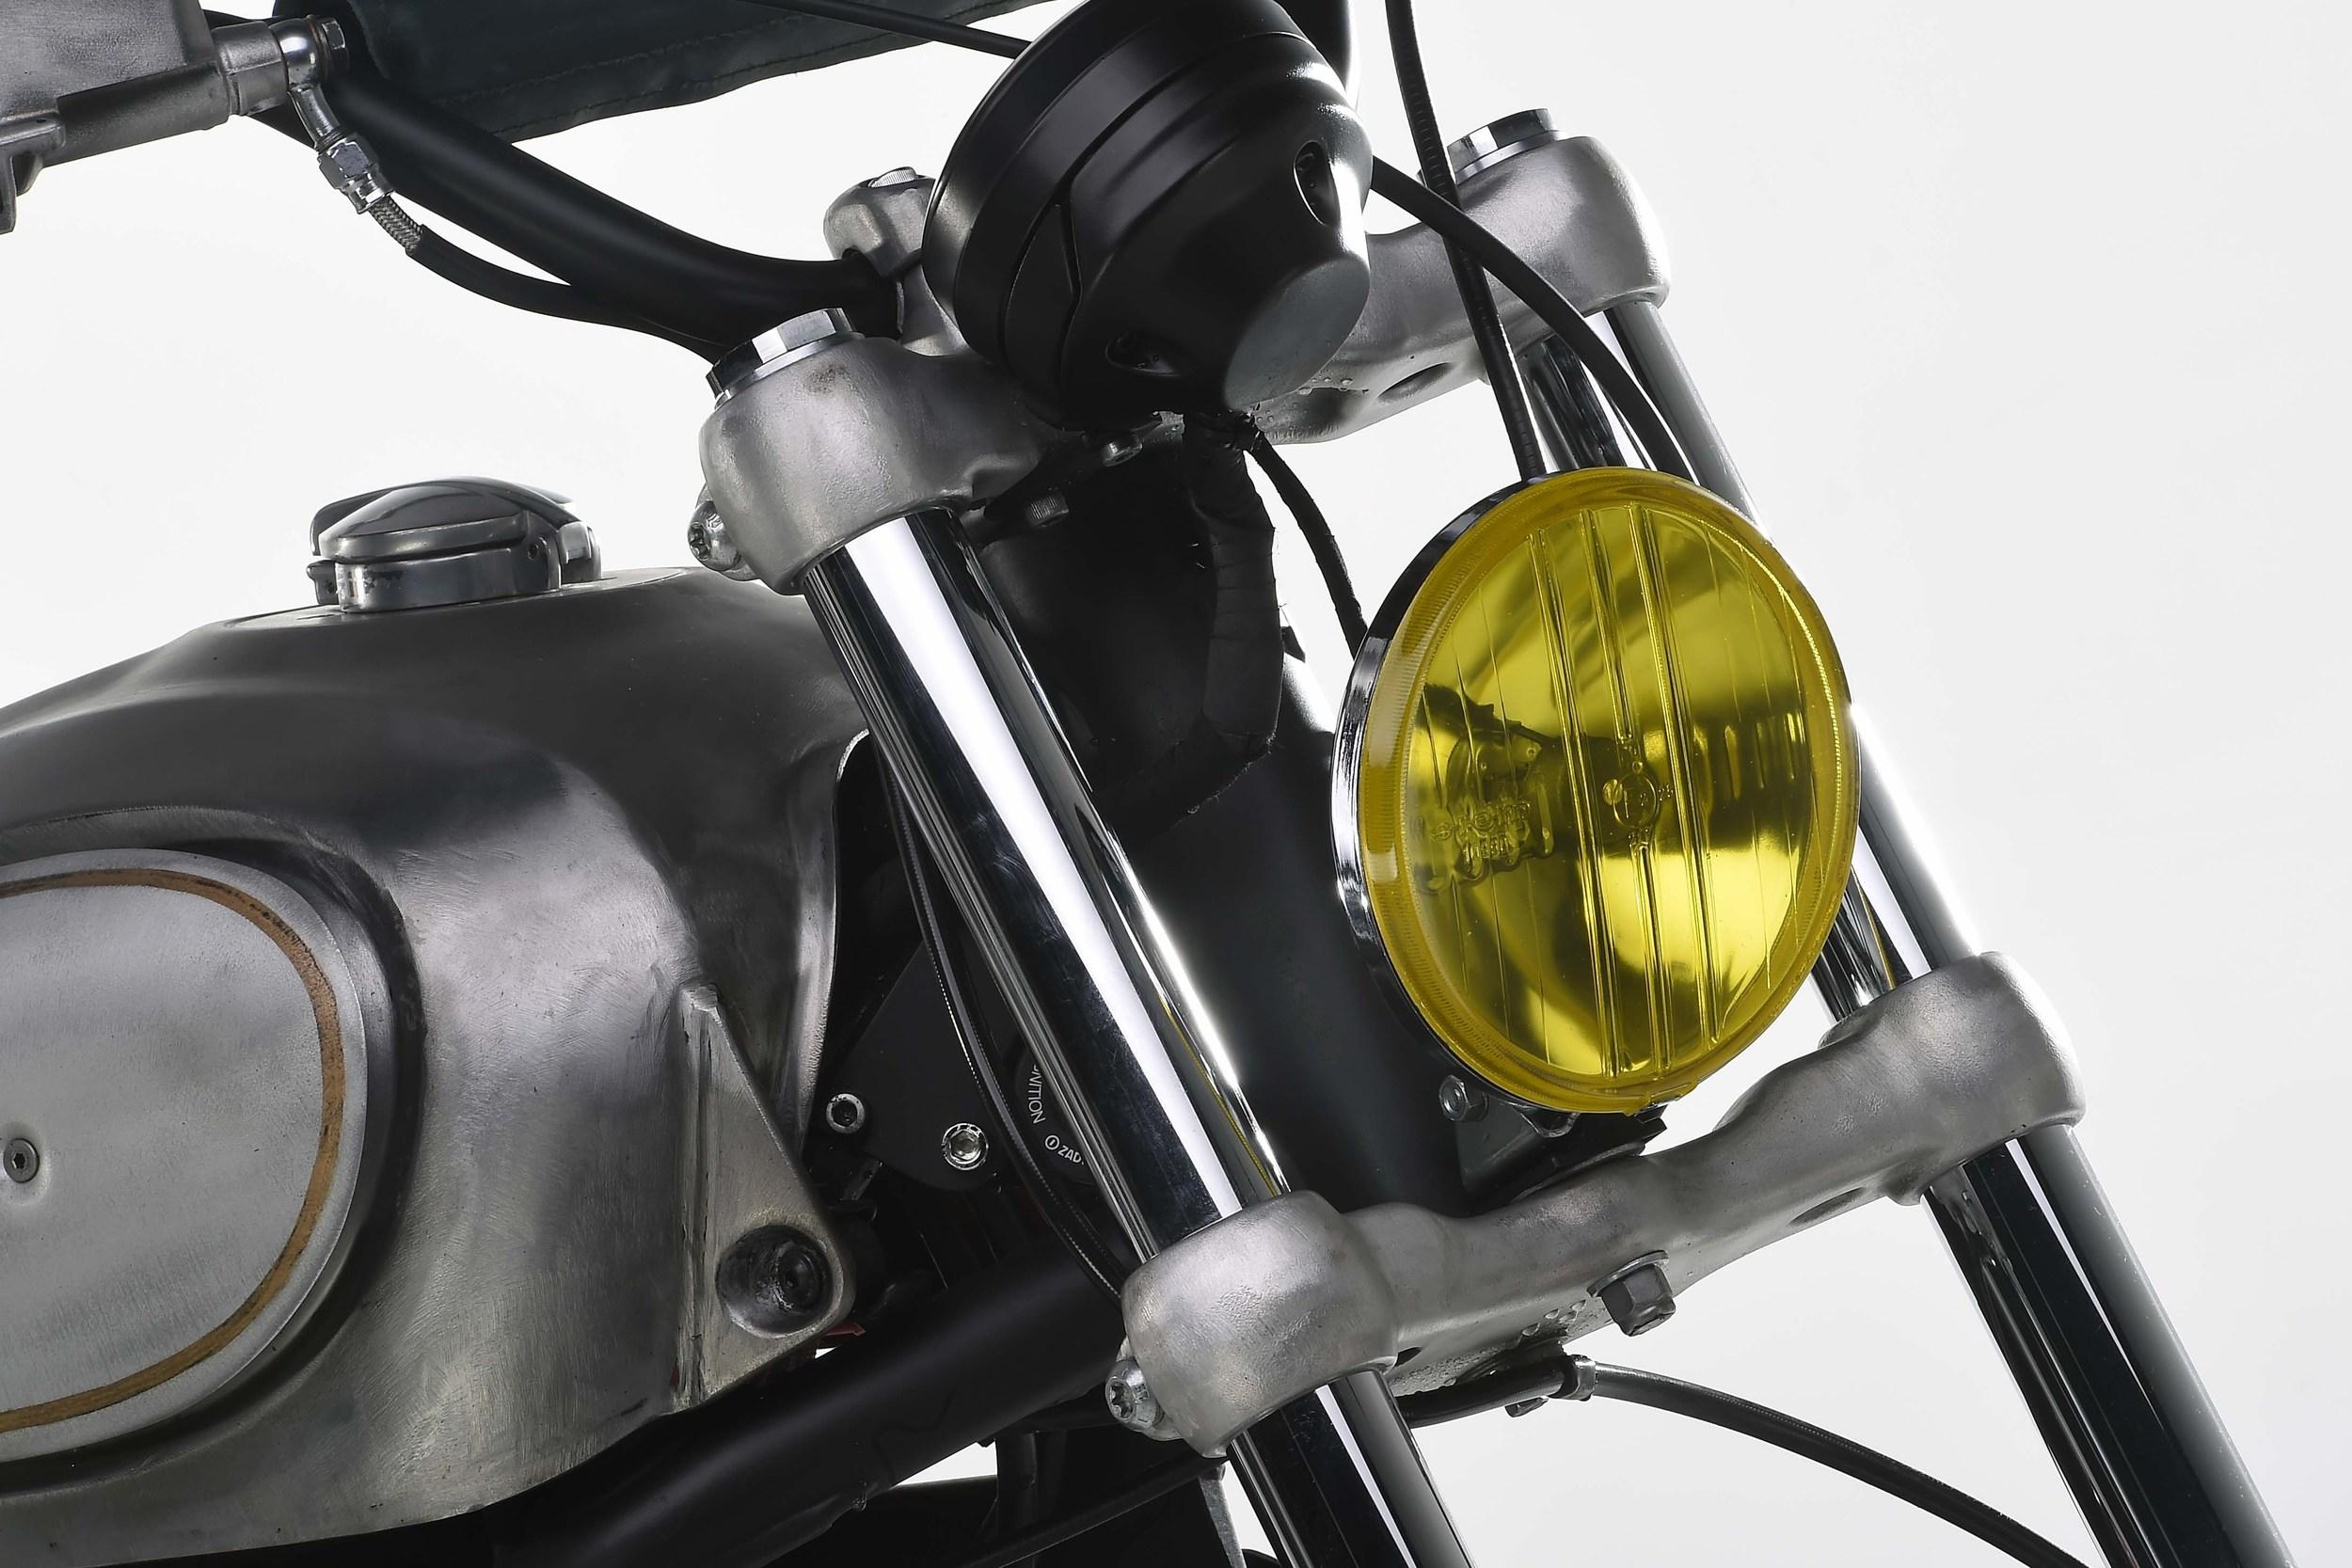 Ducati-Scrambler-Scratch-Concept-Officine-Mermaid-Dario-Mastroianni-05.jpg